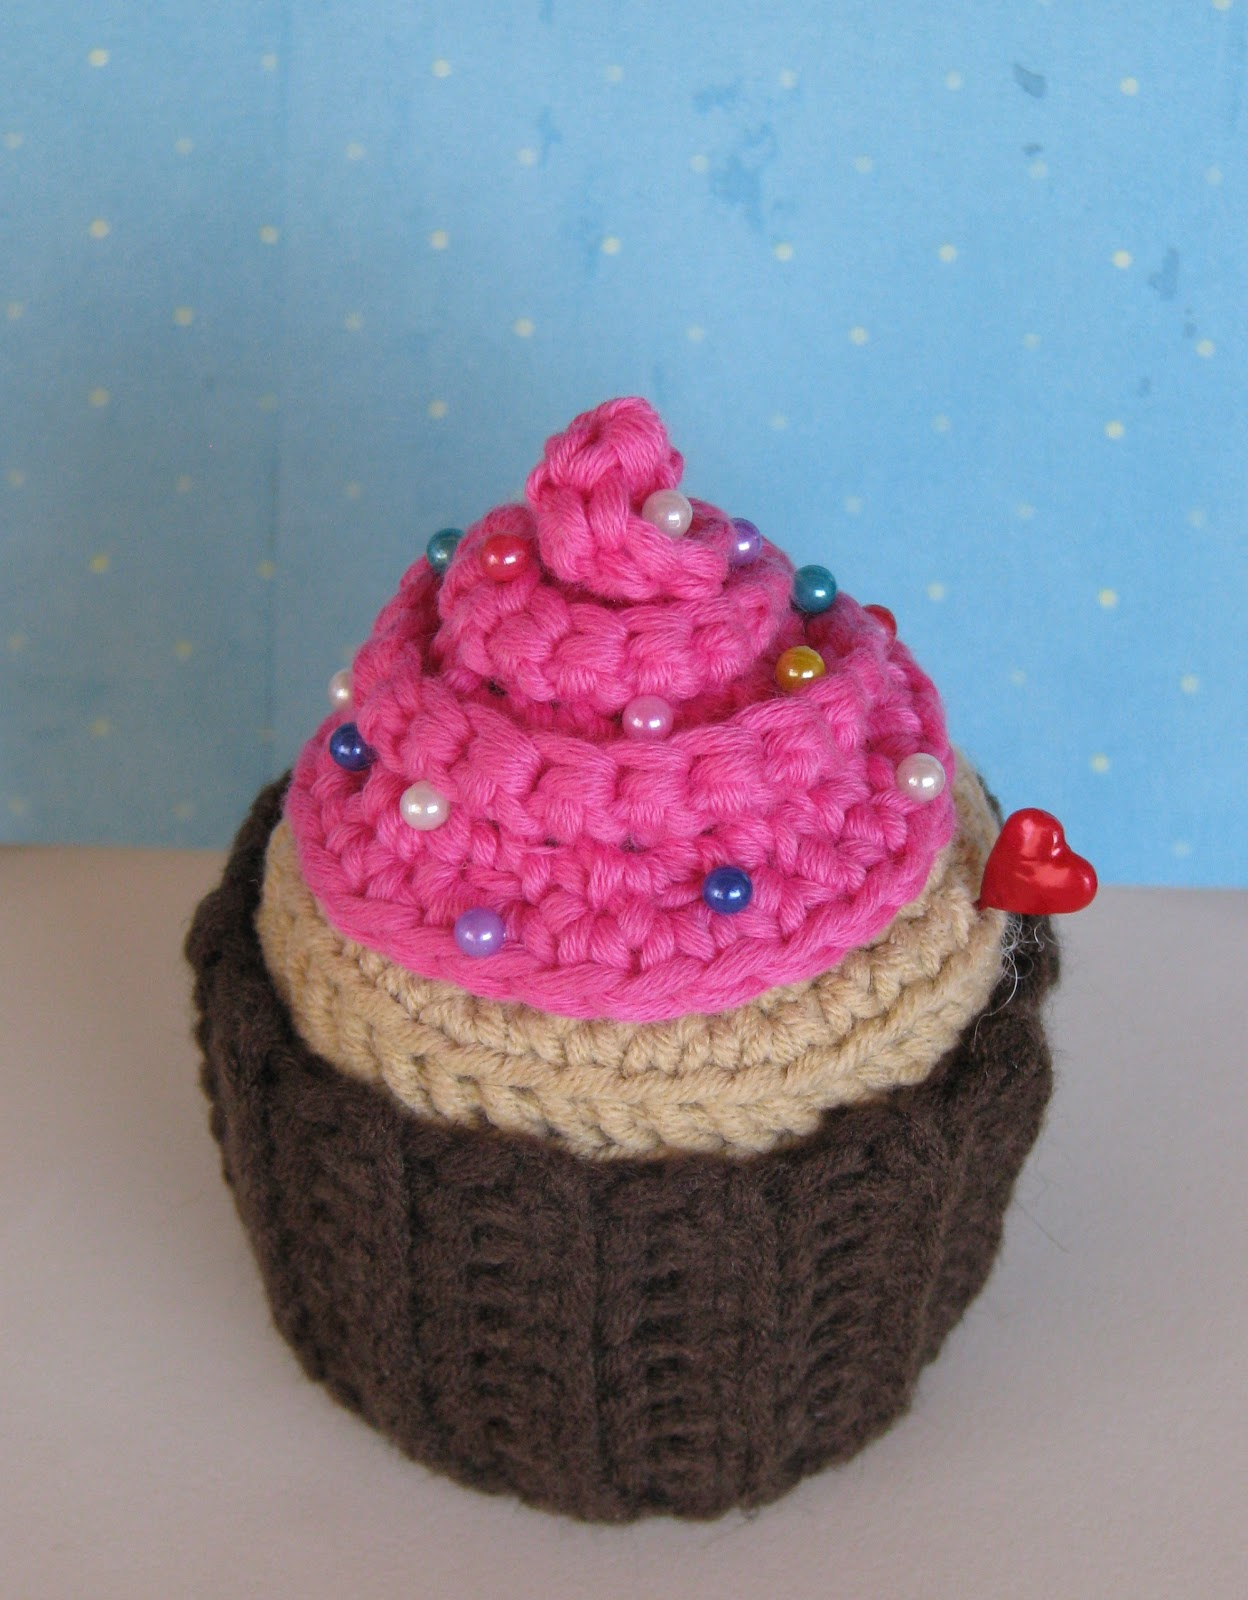 CAKE CROCHET FREE PATTERN – Crochet Patterns